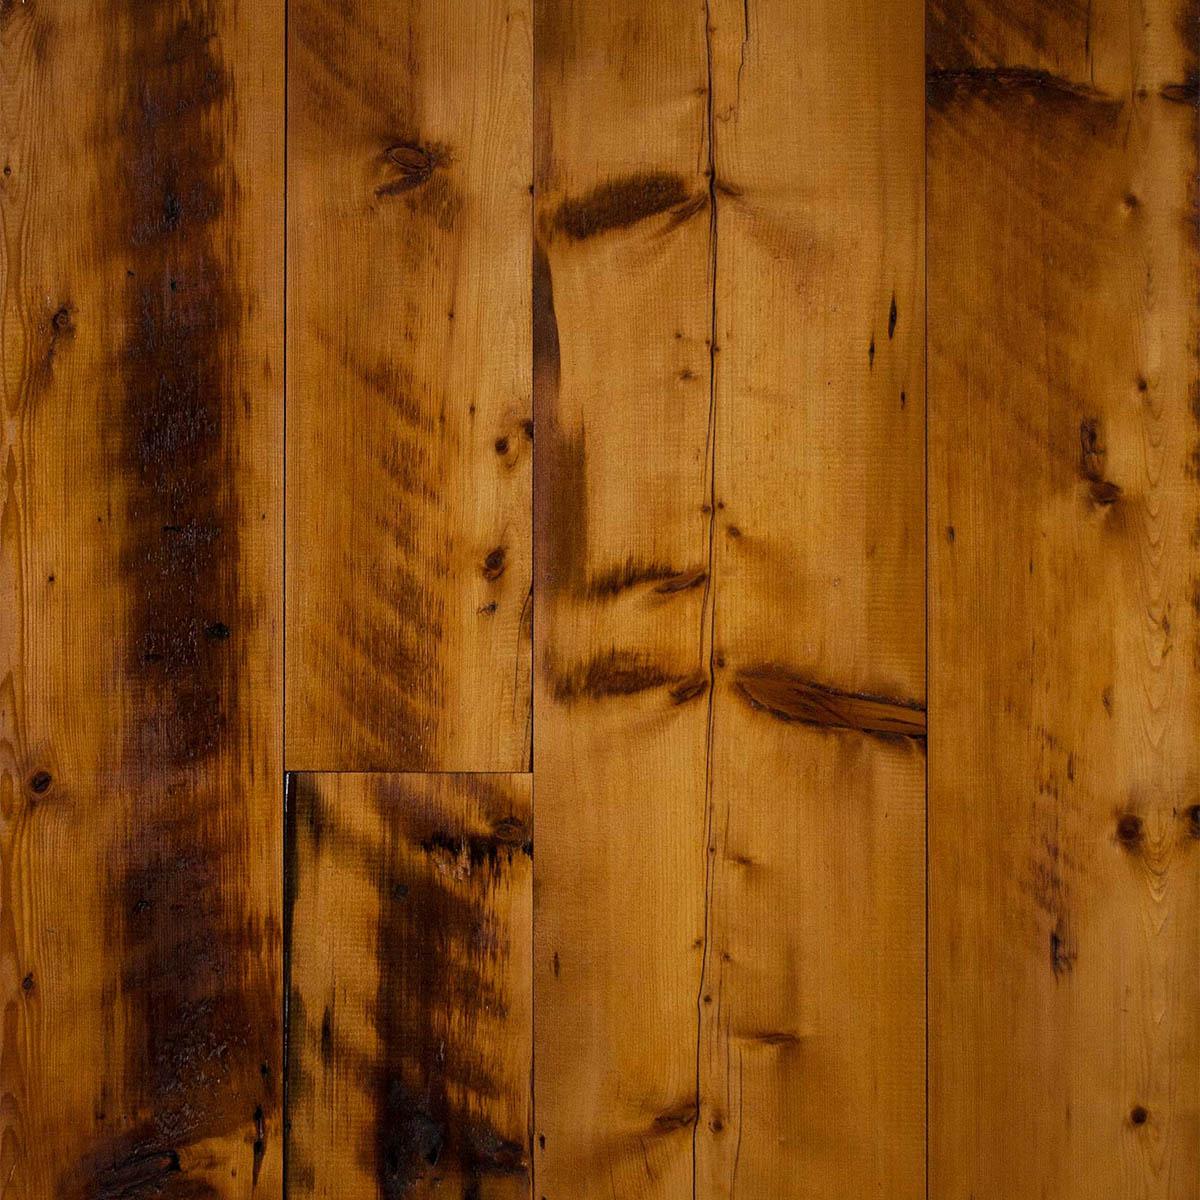 Longleaf Lumber Skip Planed Reclaimed Spruce Paneling